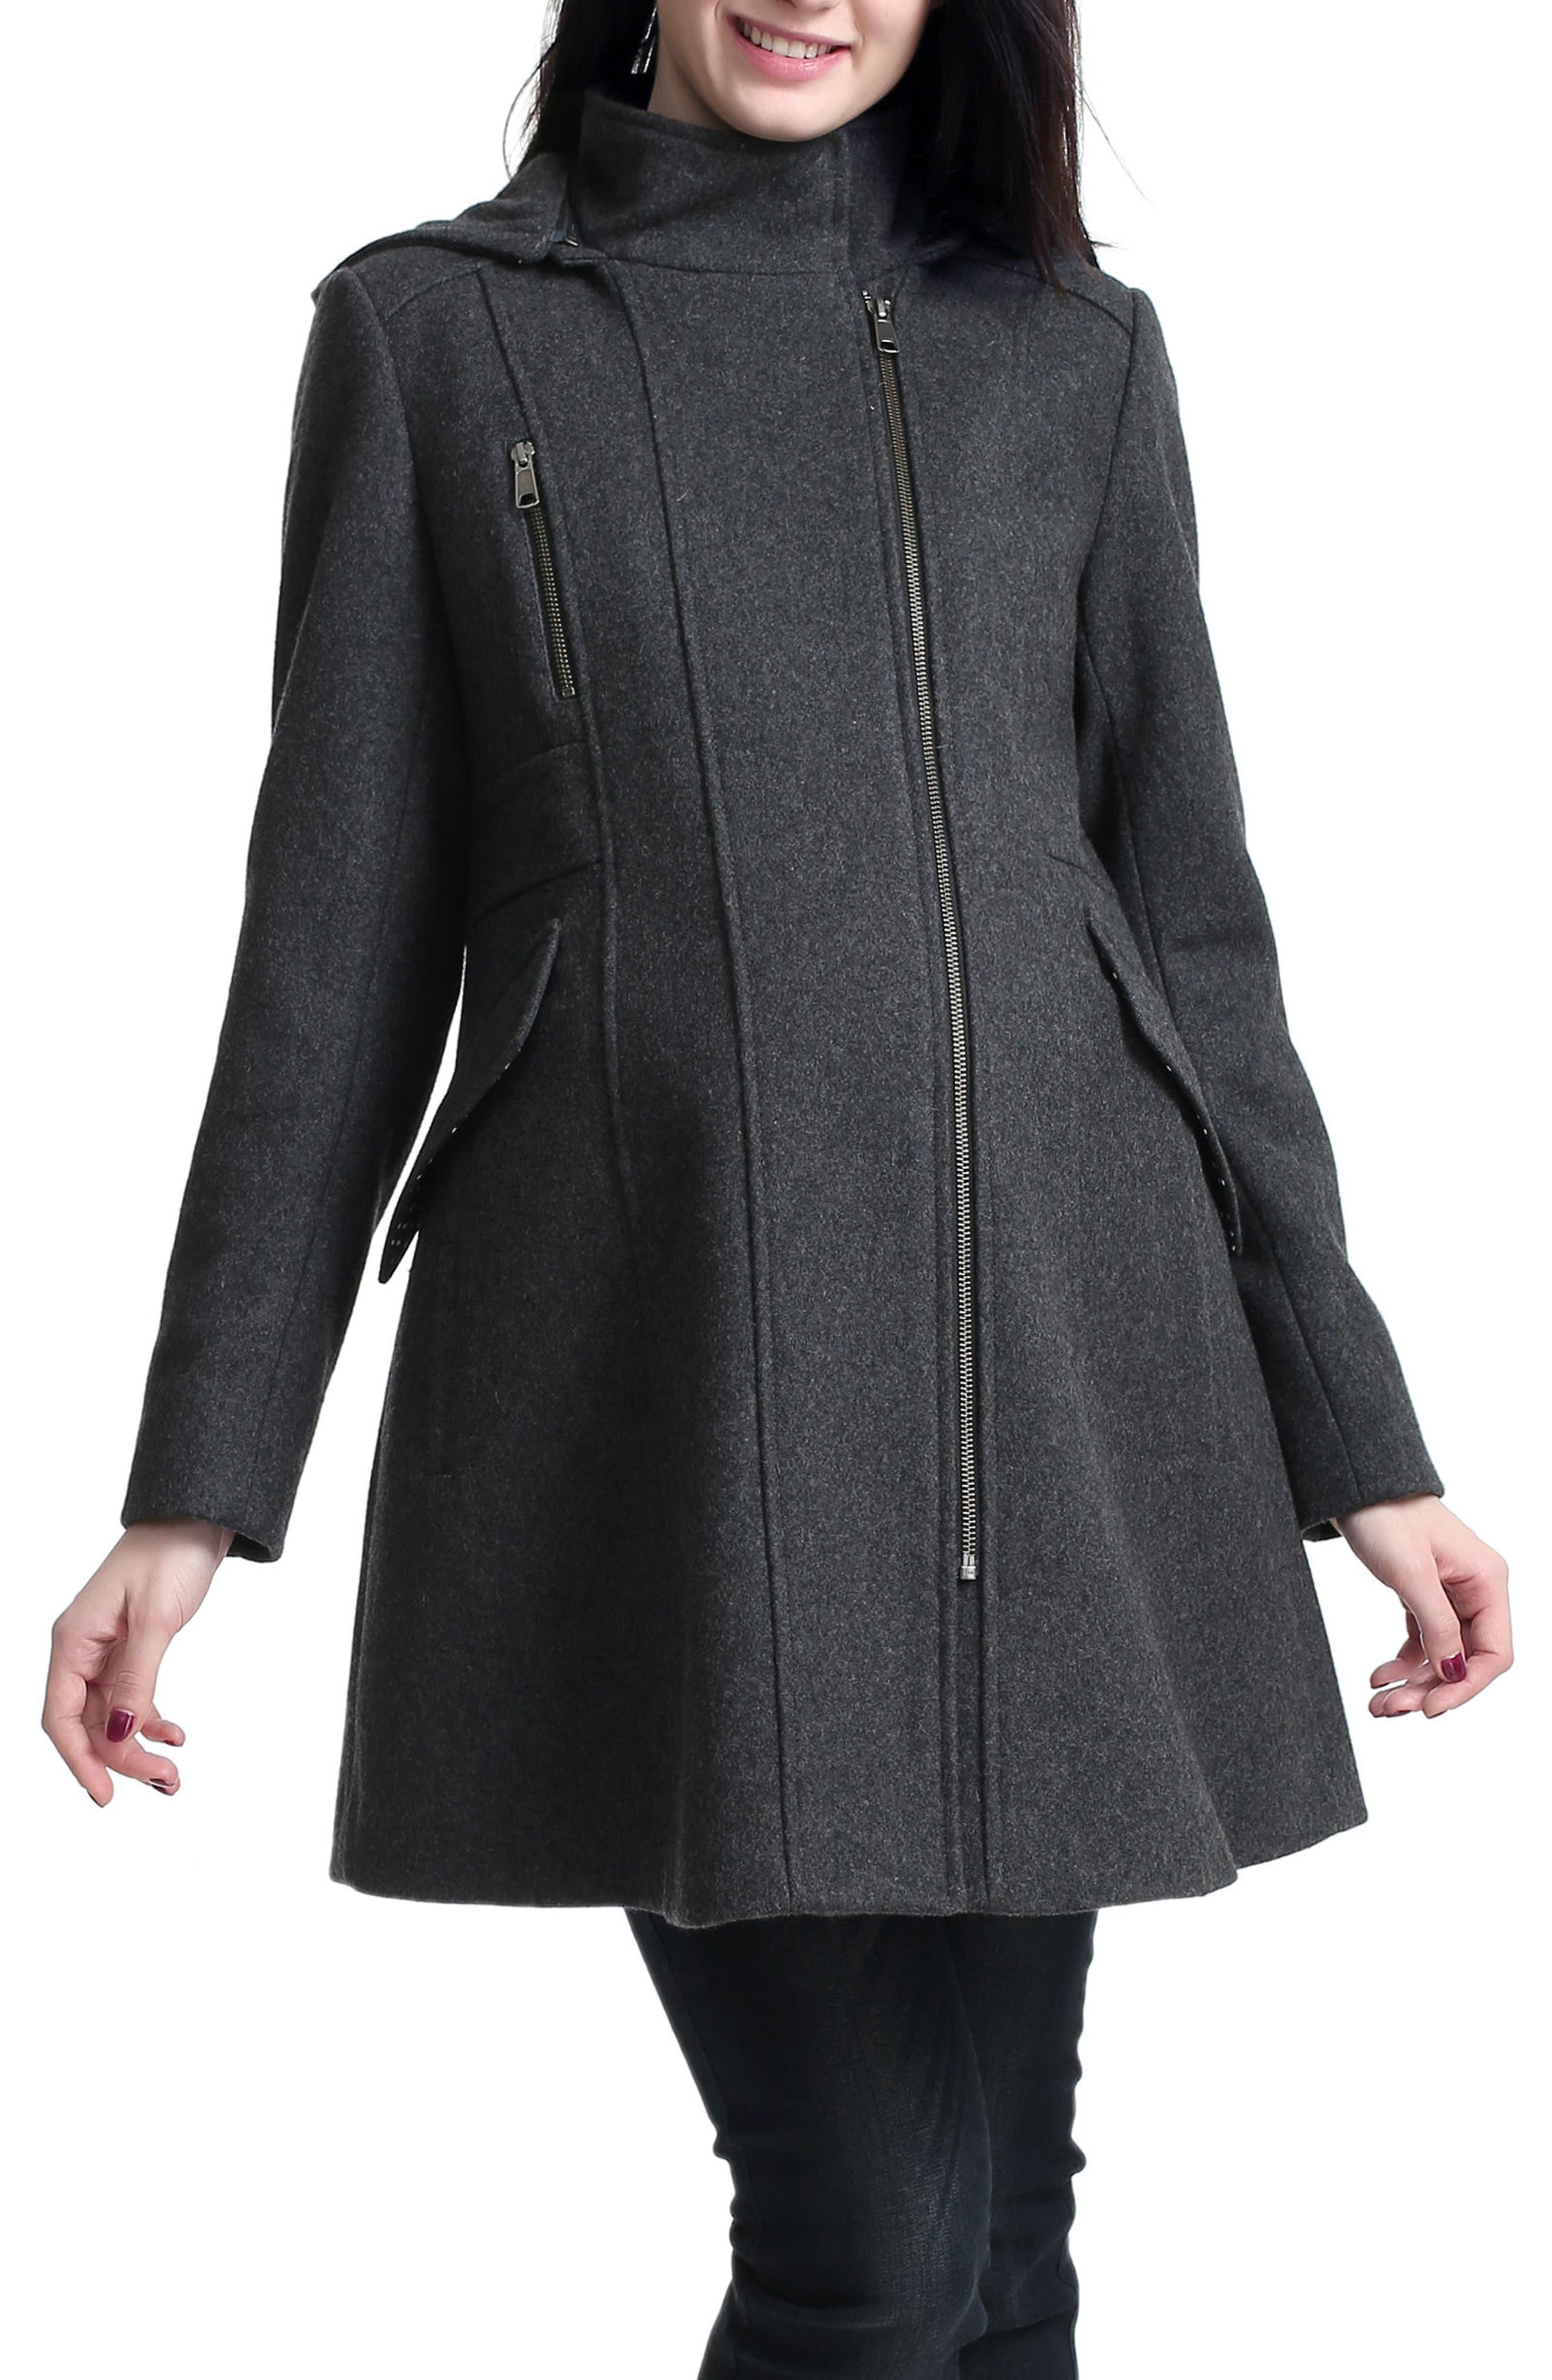 Alternate Image 1 Selected - Kimi and Kai Cordella Wool Blend Hooded Maternity Coat